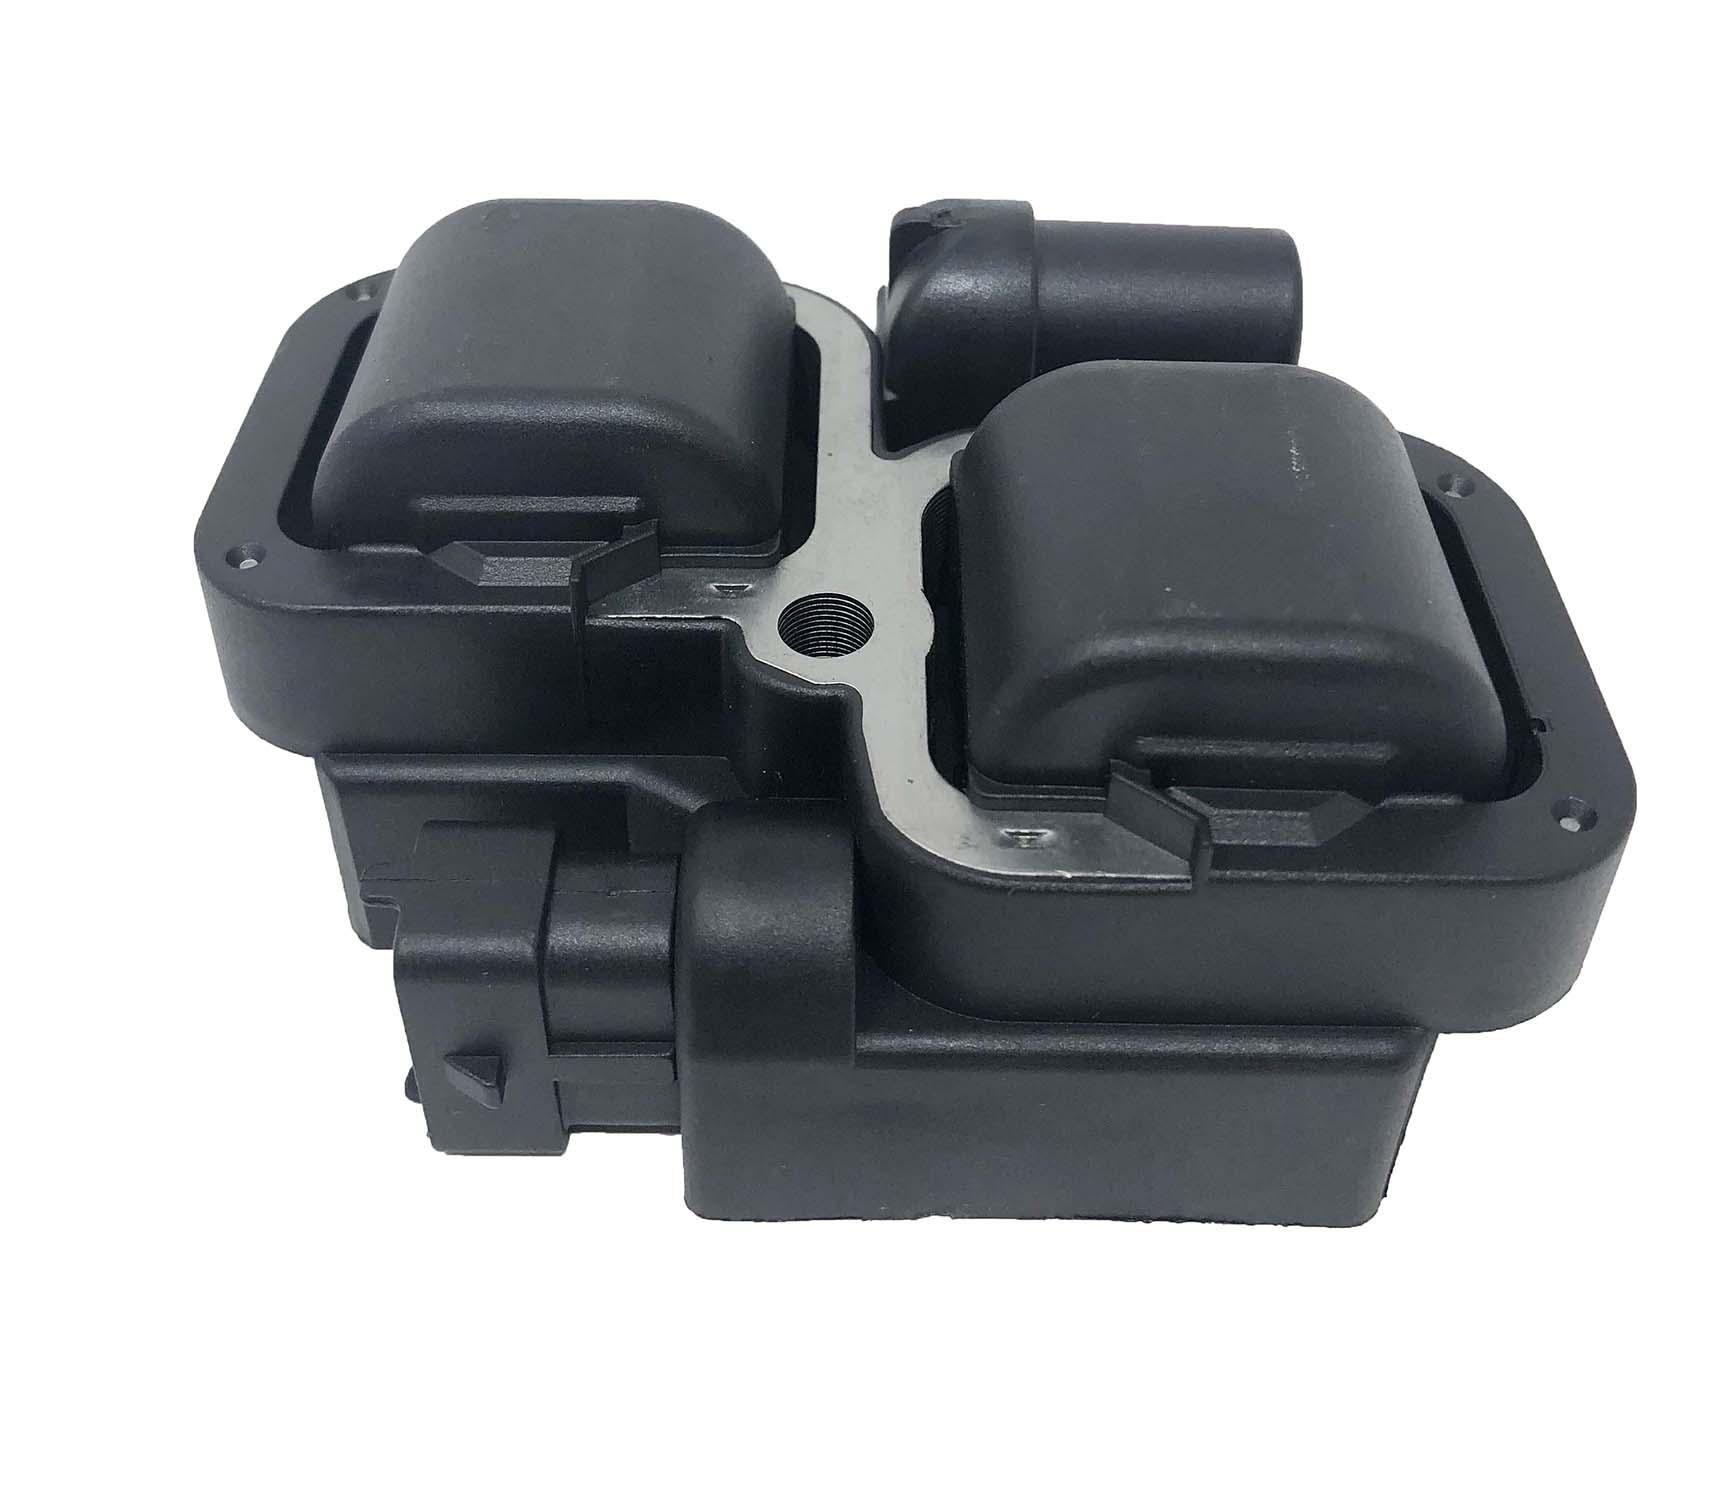 P XXC EFI 2011 DPS R 4x4 XT Ignition Coil For Can Am Outlander 800 CVT